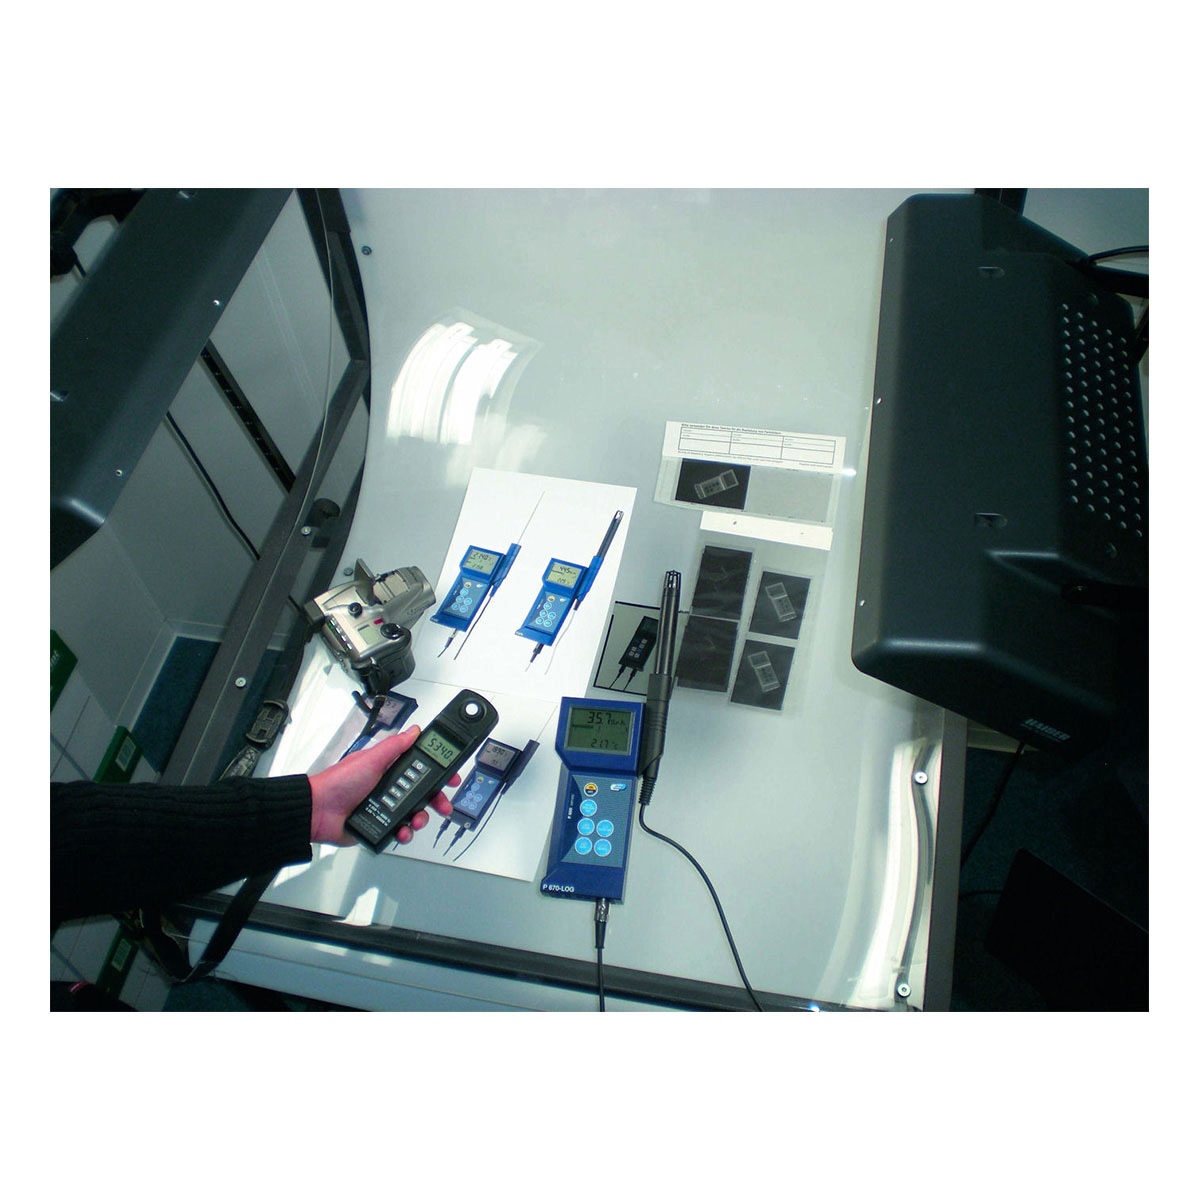 31-3000-luxmeter-lm37-anwendung-1200x1200px.jpg